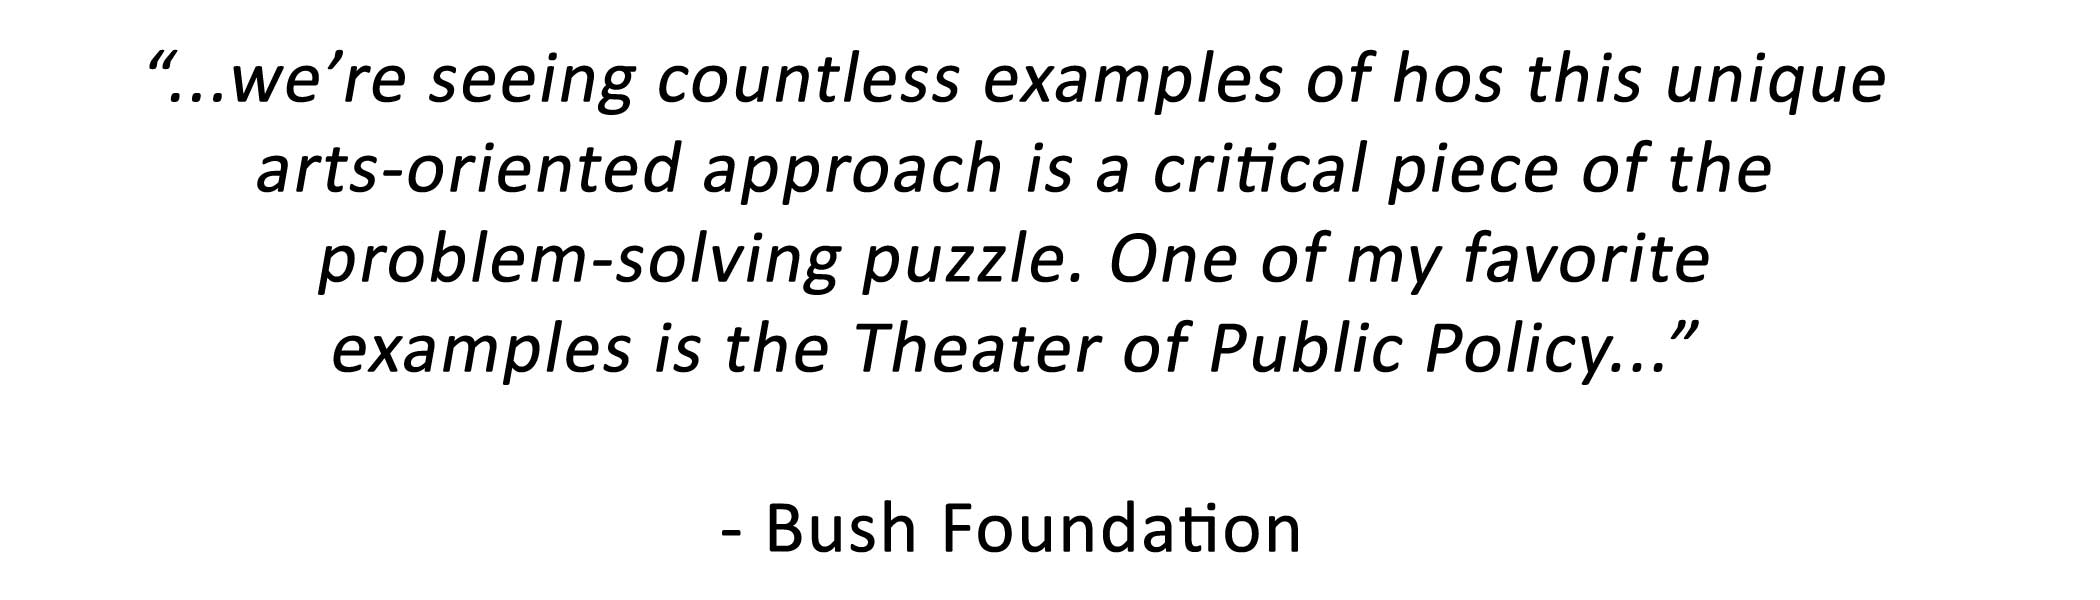 Bush-Foundation.jpg